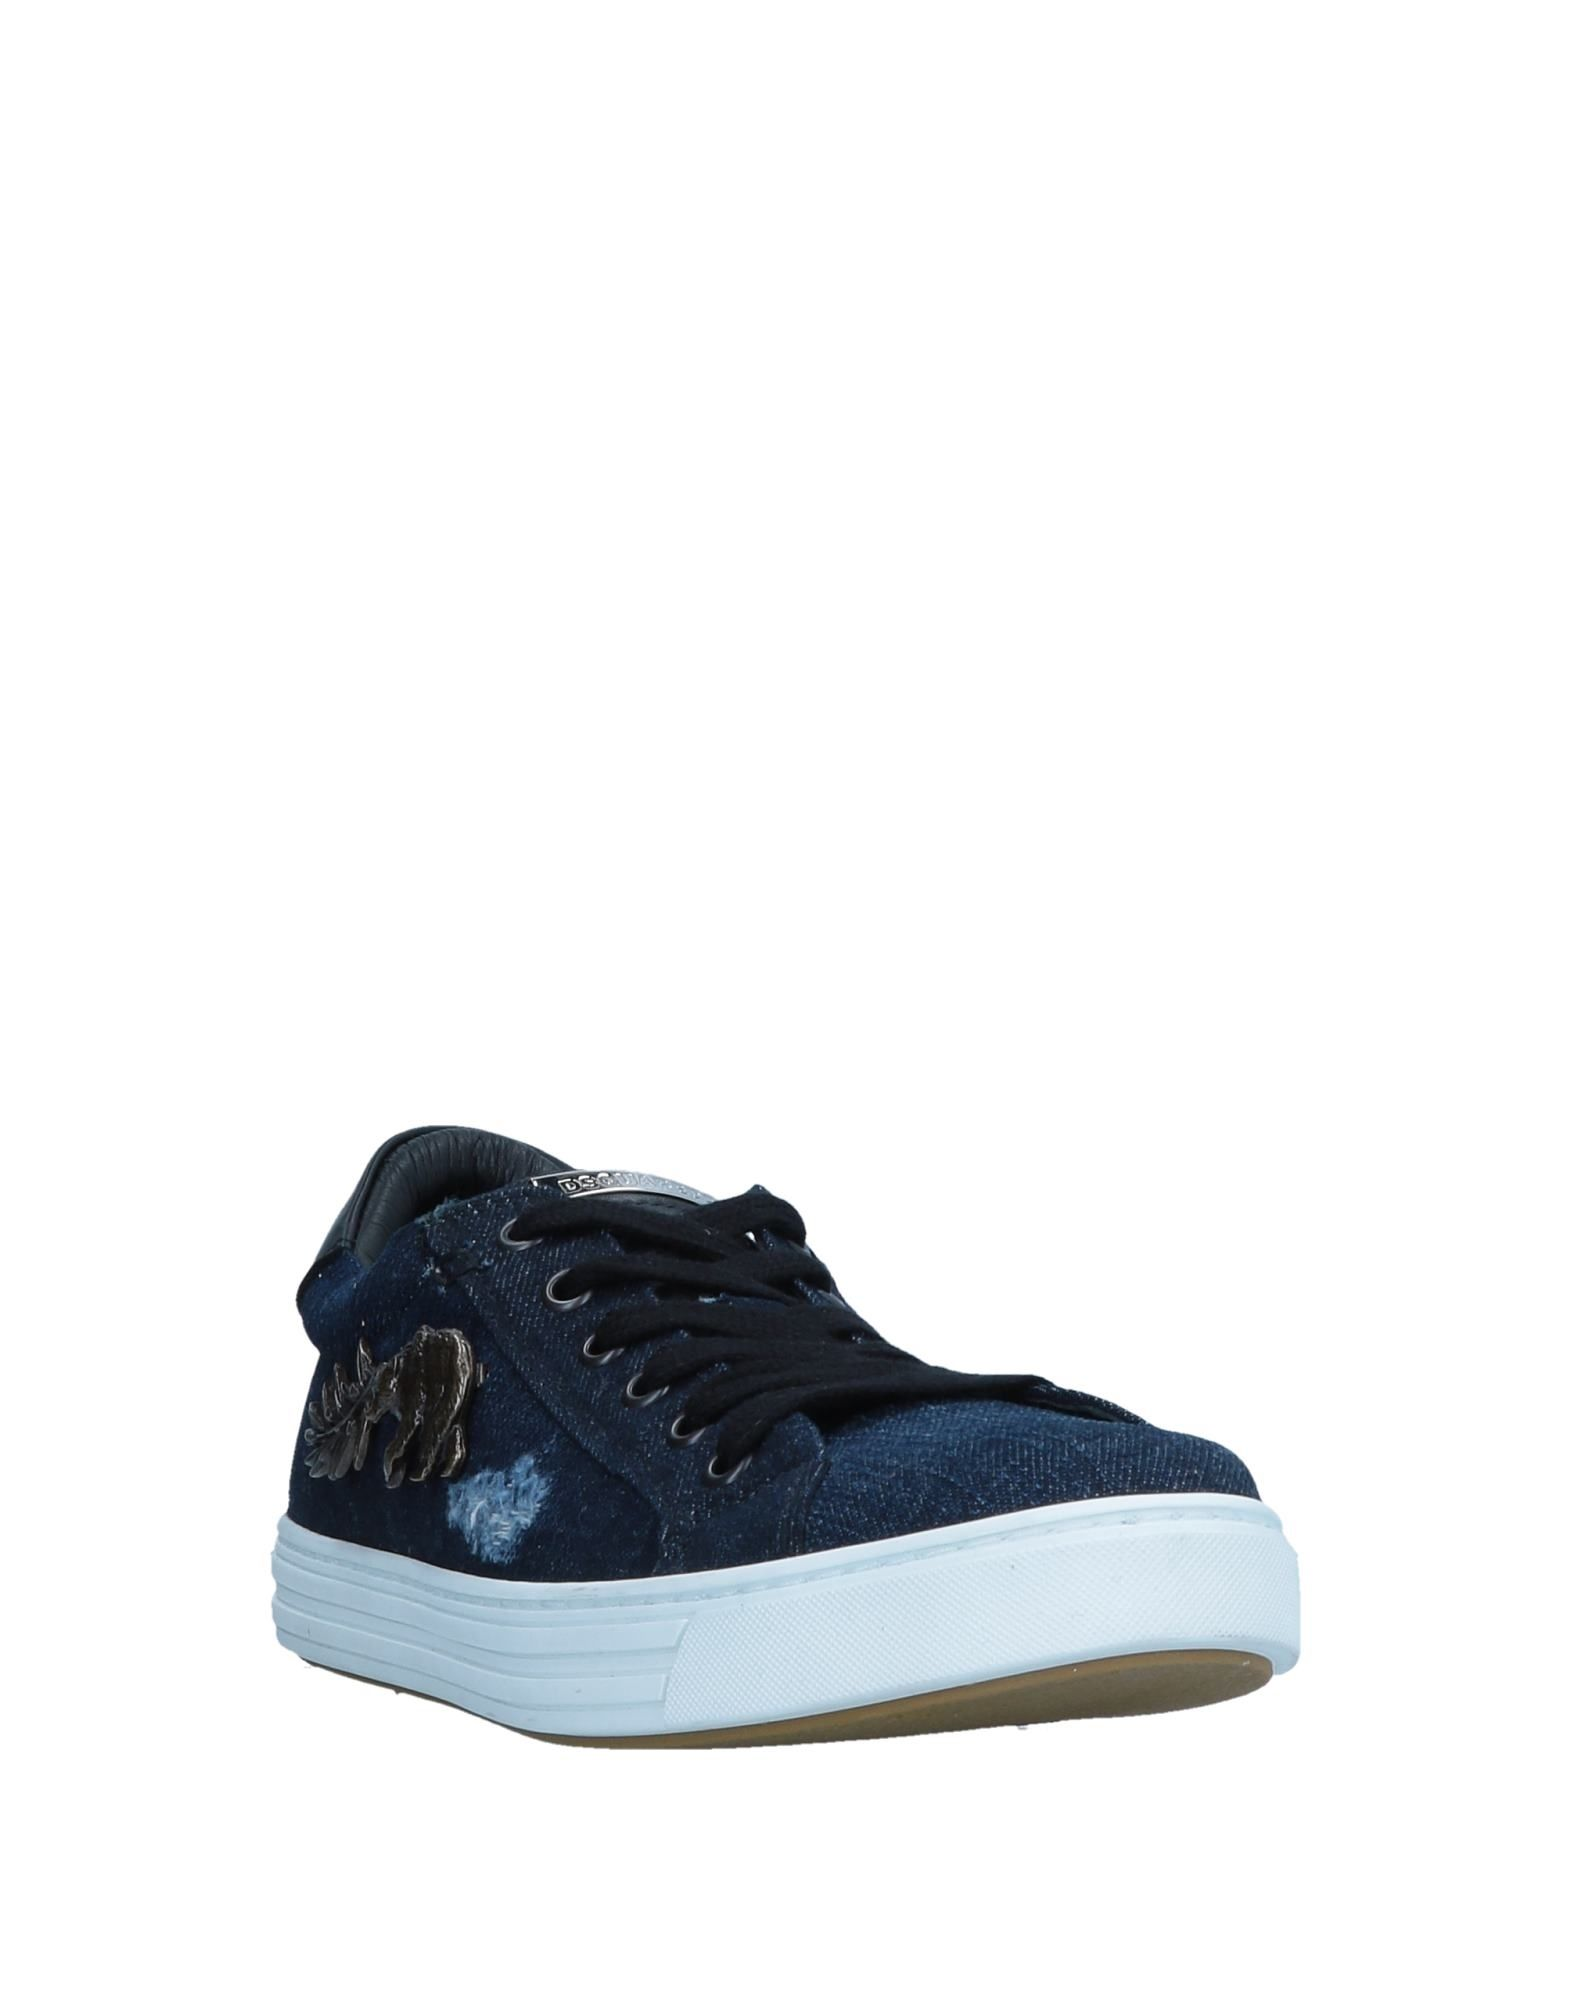 Rabatt Schuhe Dsquared2 Sneakers  Damen  Sneakers 11553893OS a1dc07